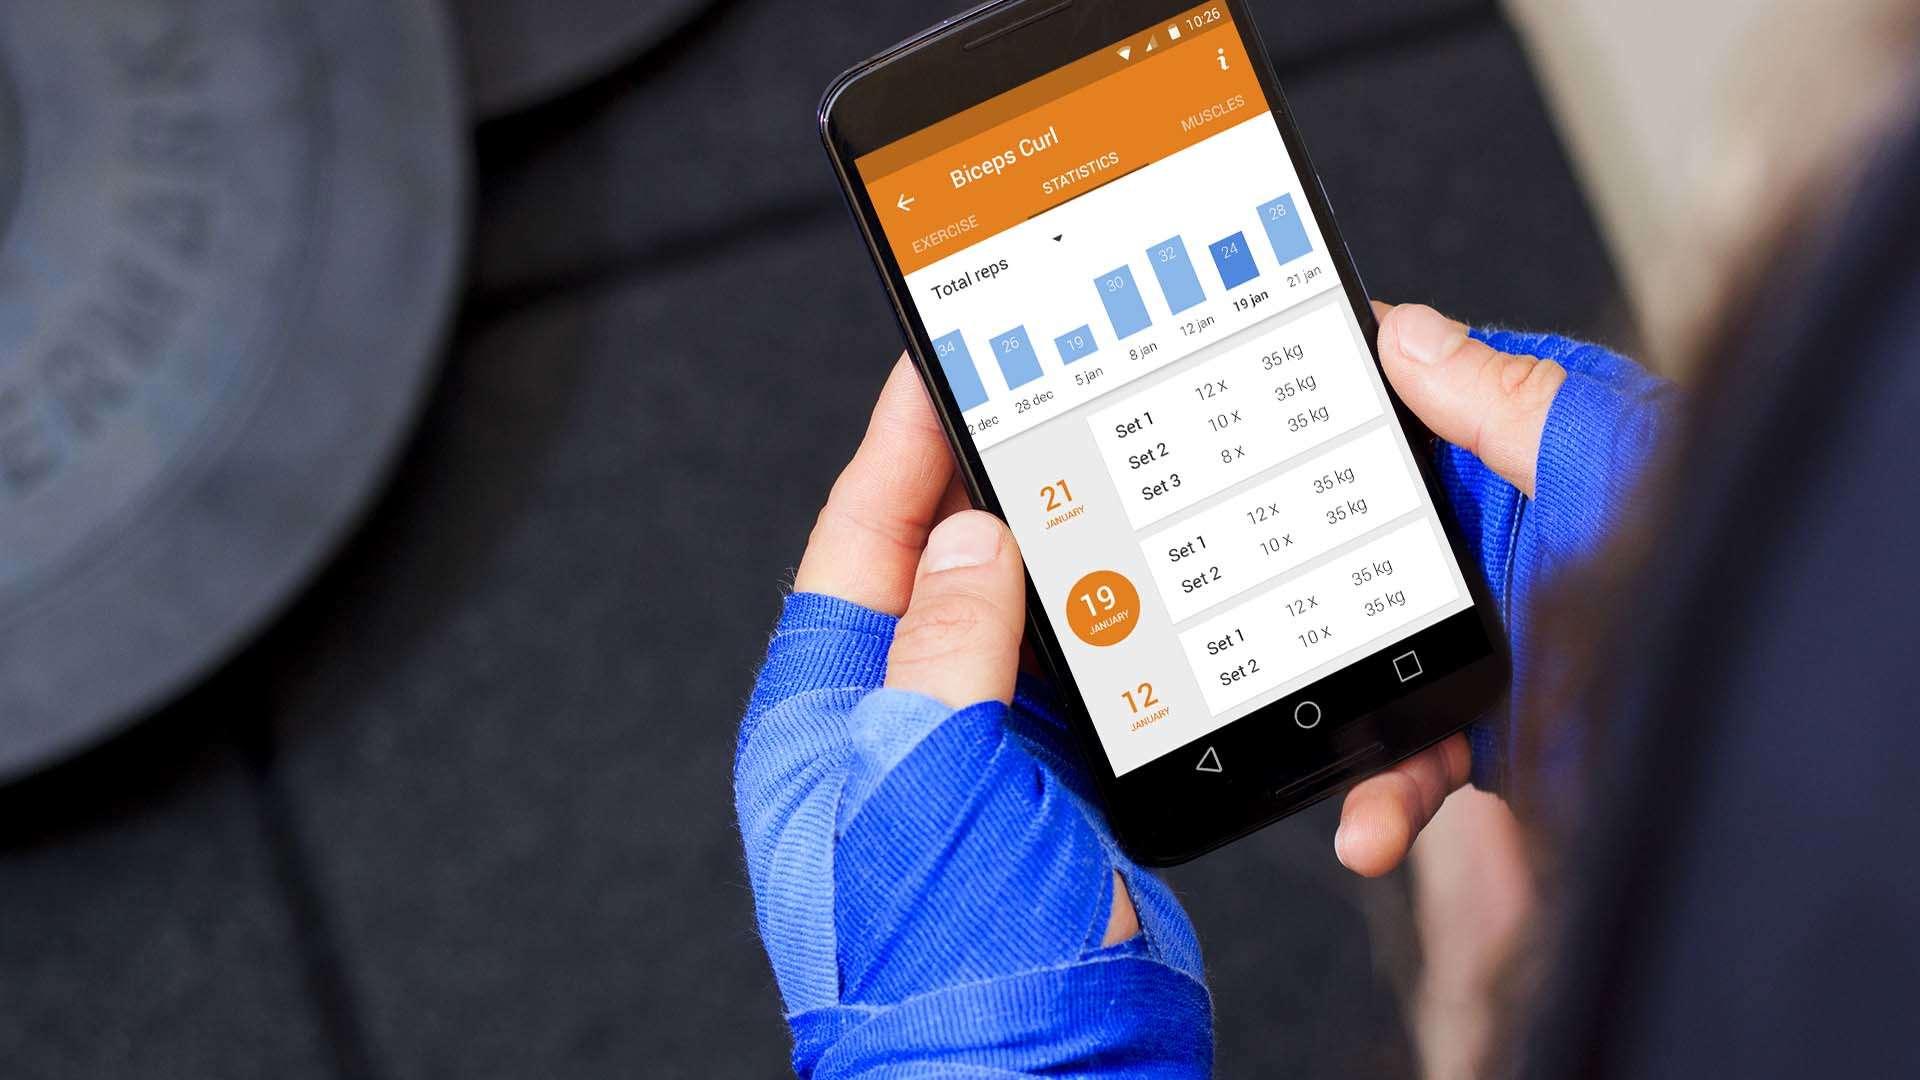 Virtuagym Personal Trainer App